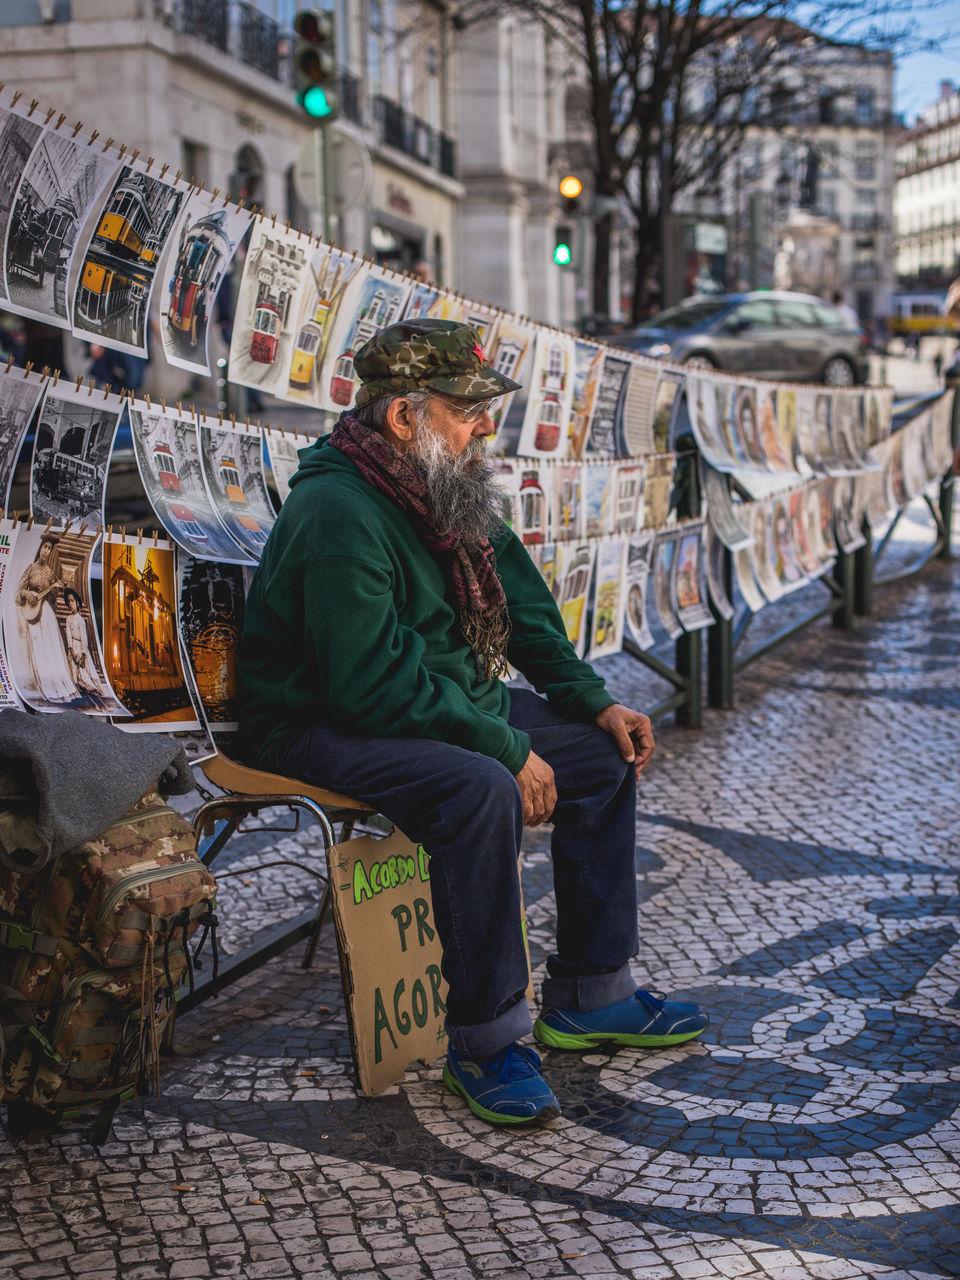 FULL LENGTH OF MAN SITTING ON FOOTPATH AT STREET MARKET